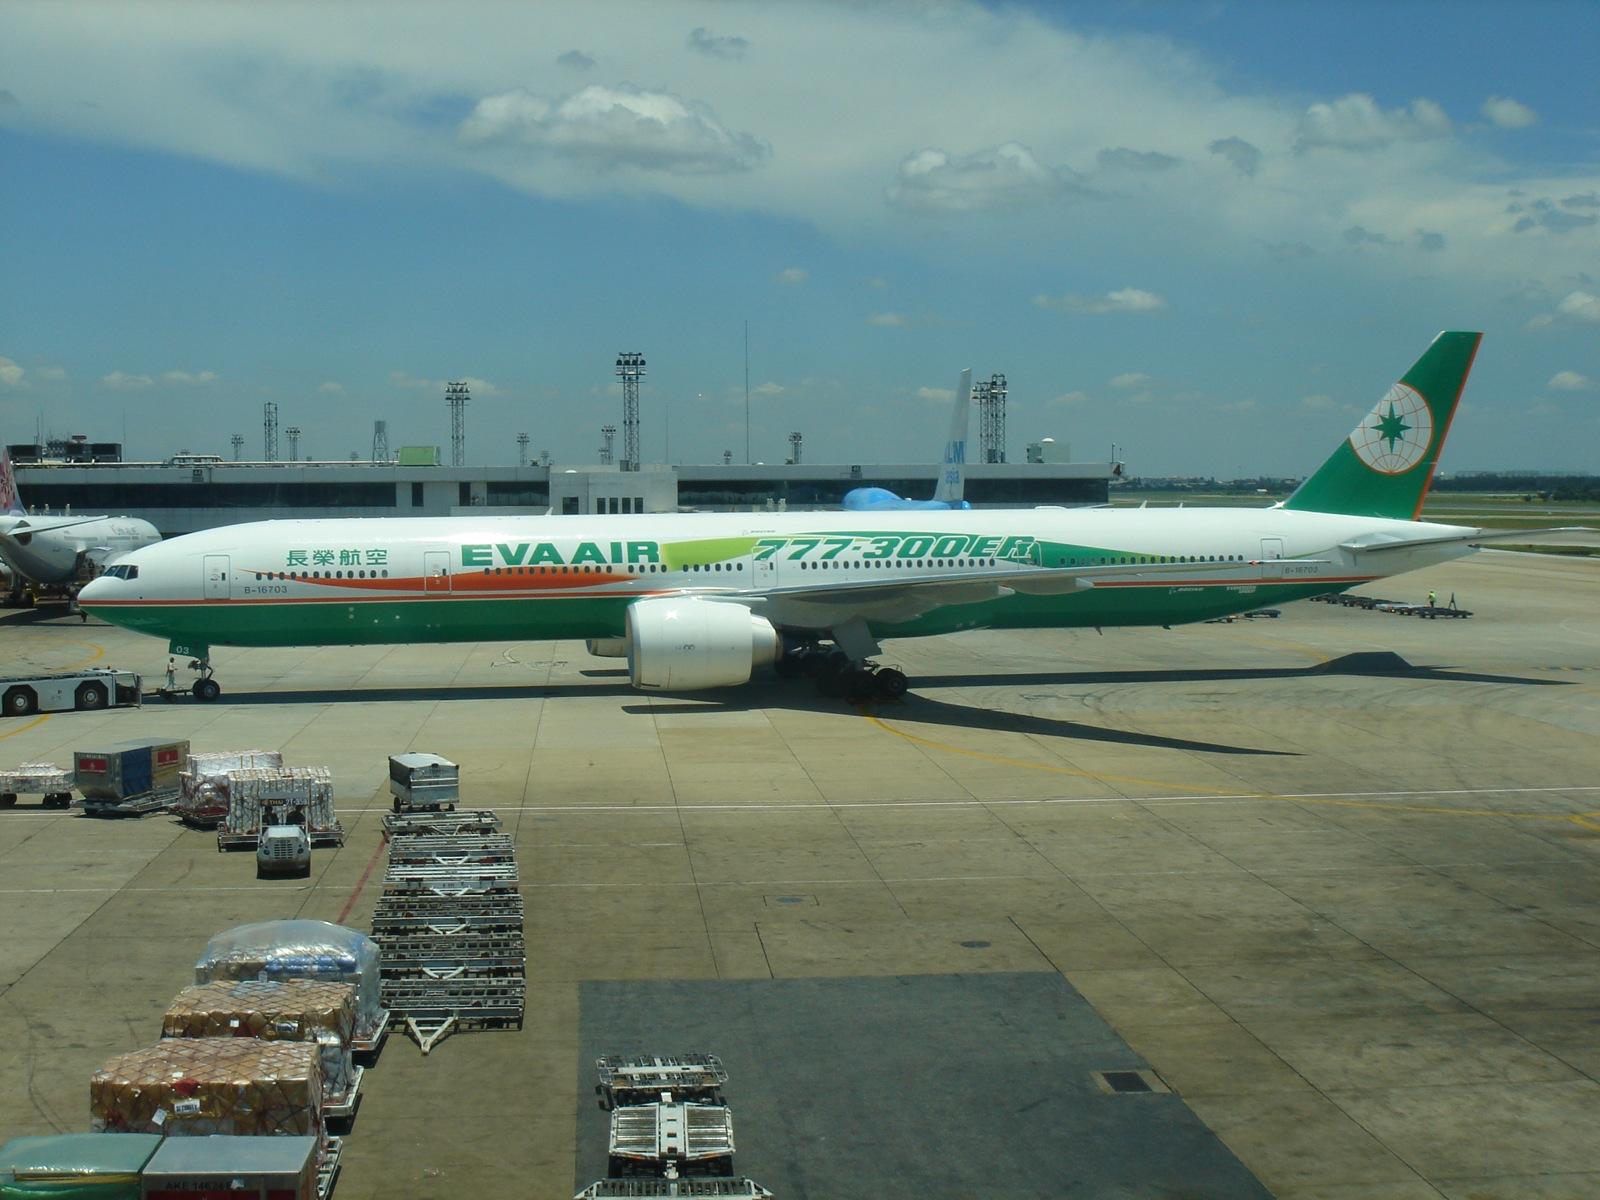 Plik:EVA Air Boeing 777-300ER.jpg – Wikipedia, wolna ... - photo#25